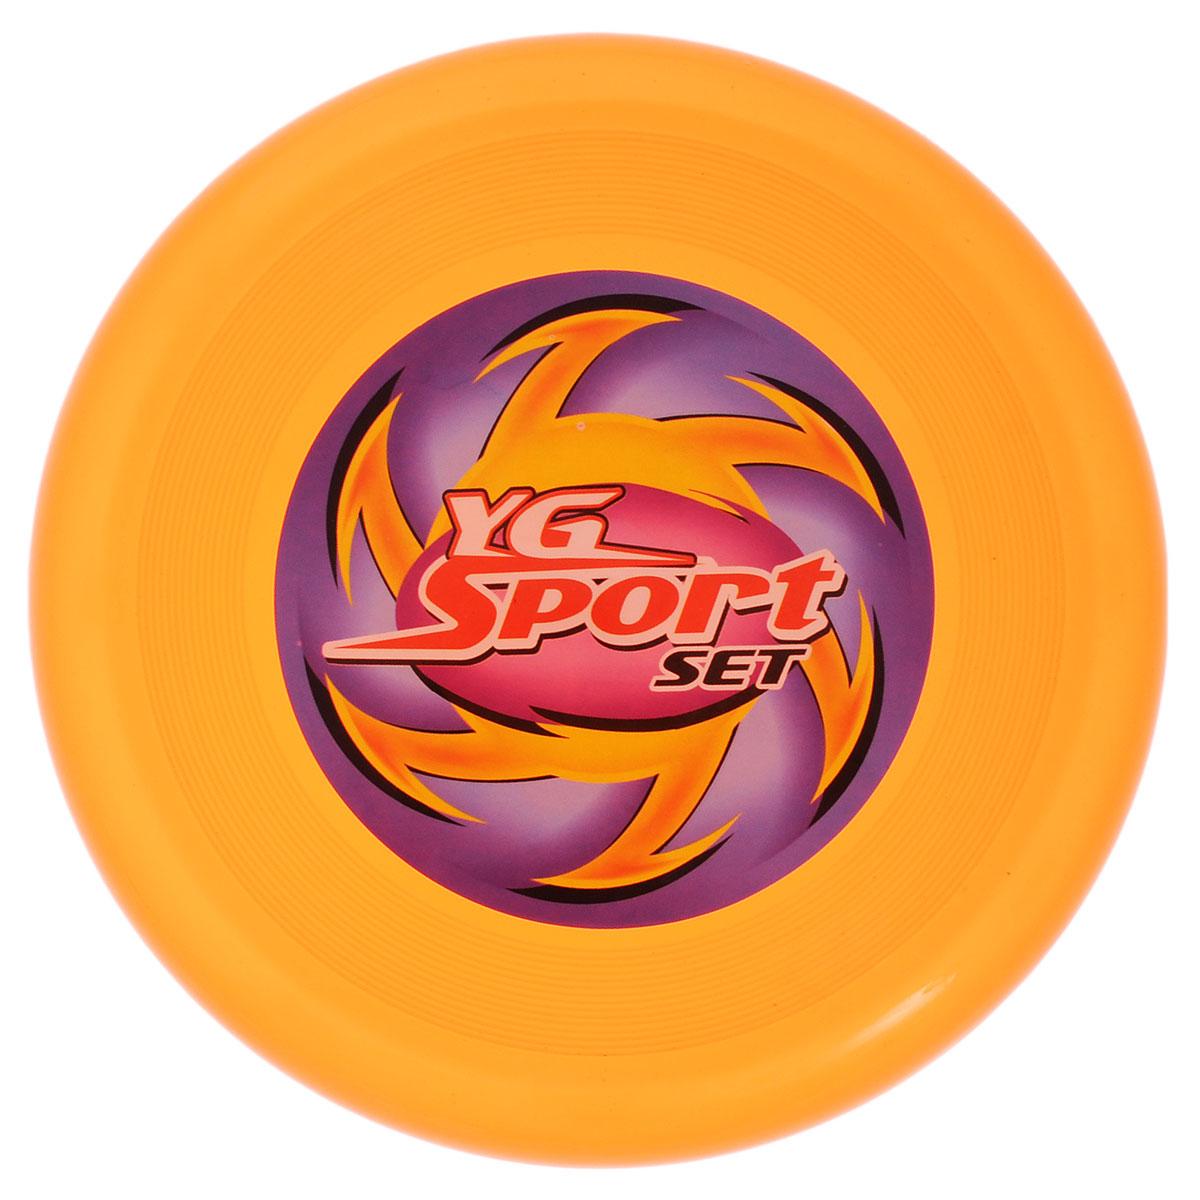 YG Sport Летающий диск цвет оранжевый